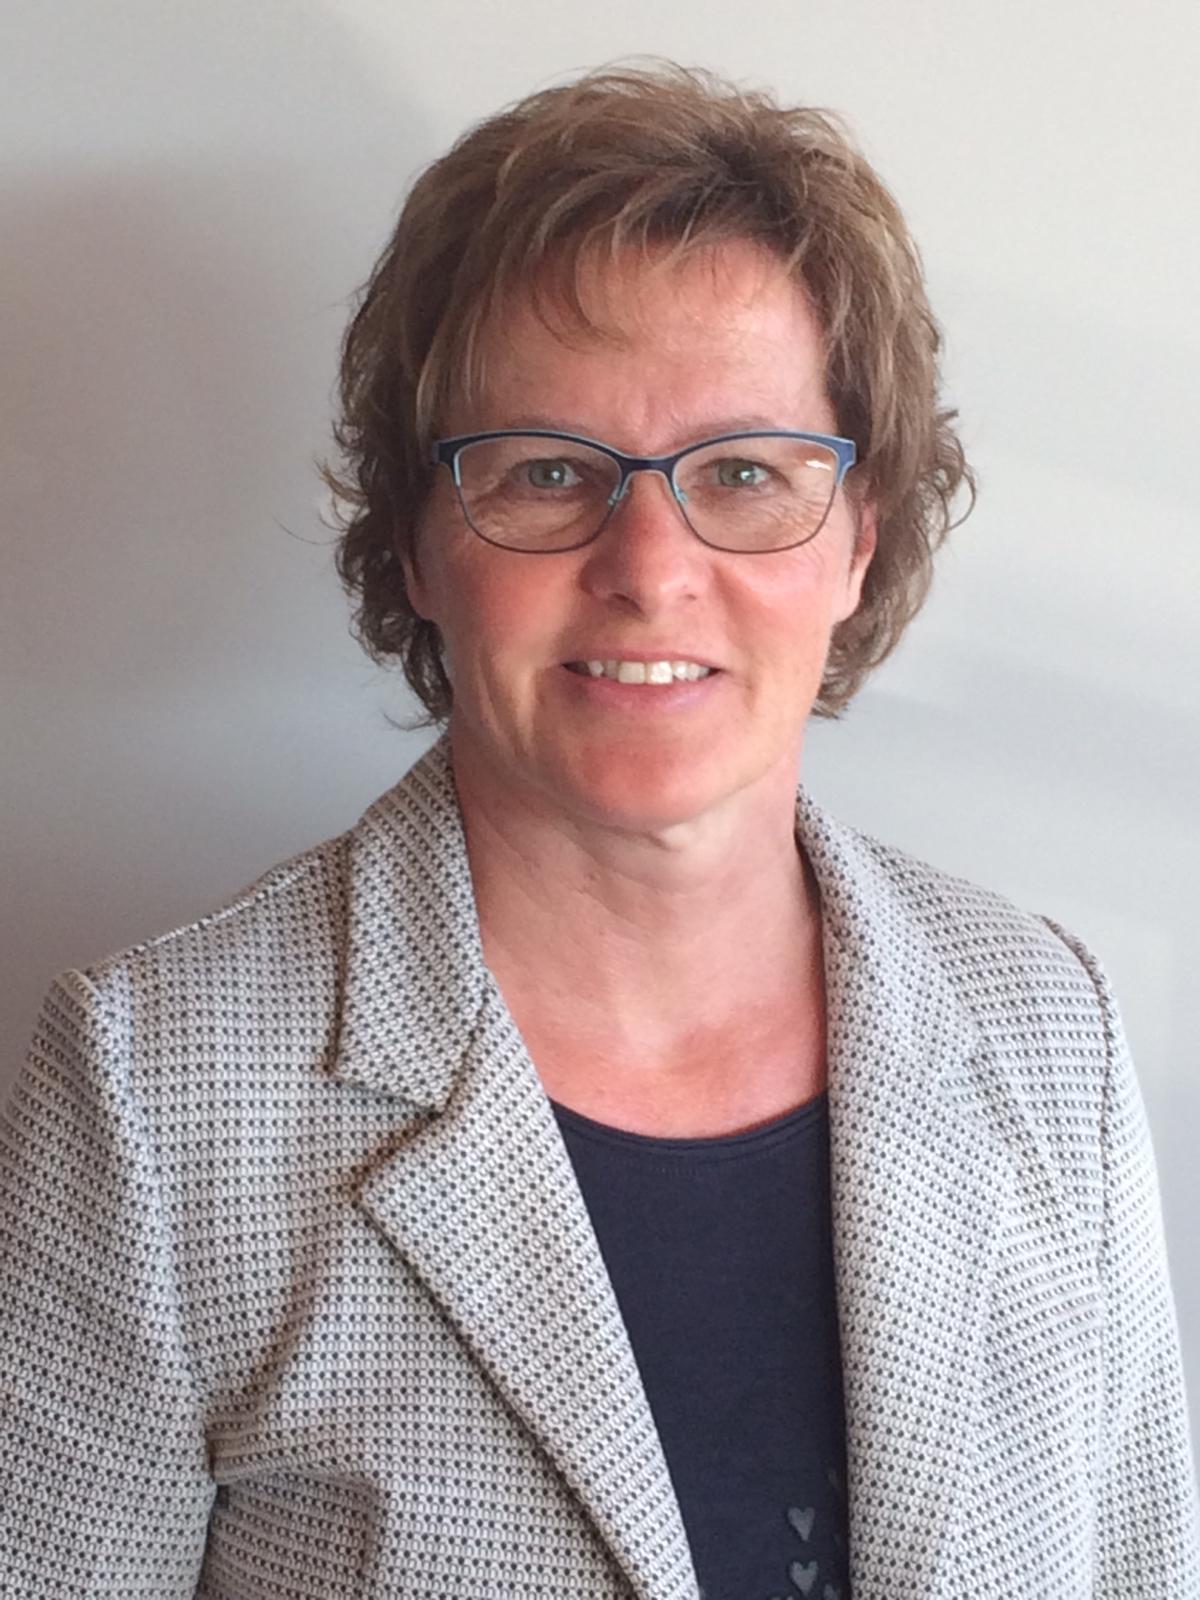 Beatrice Witschi